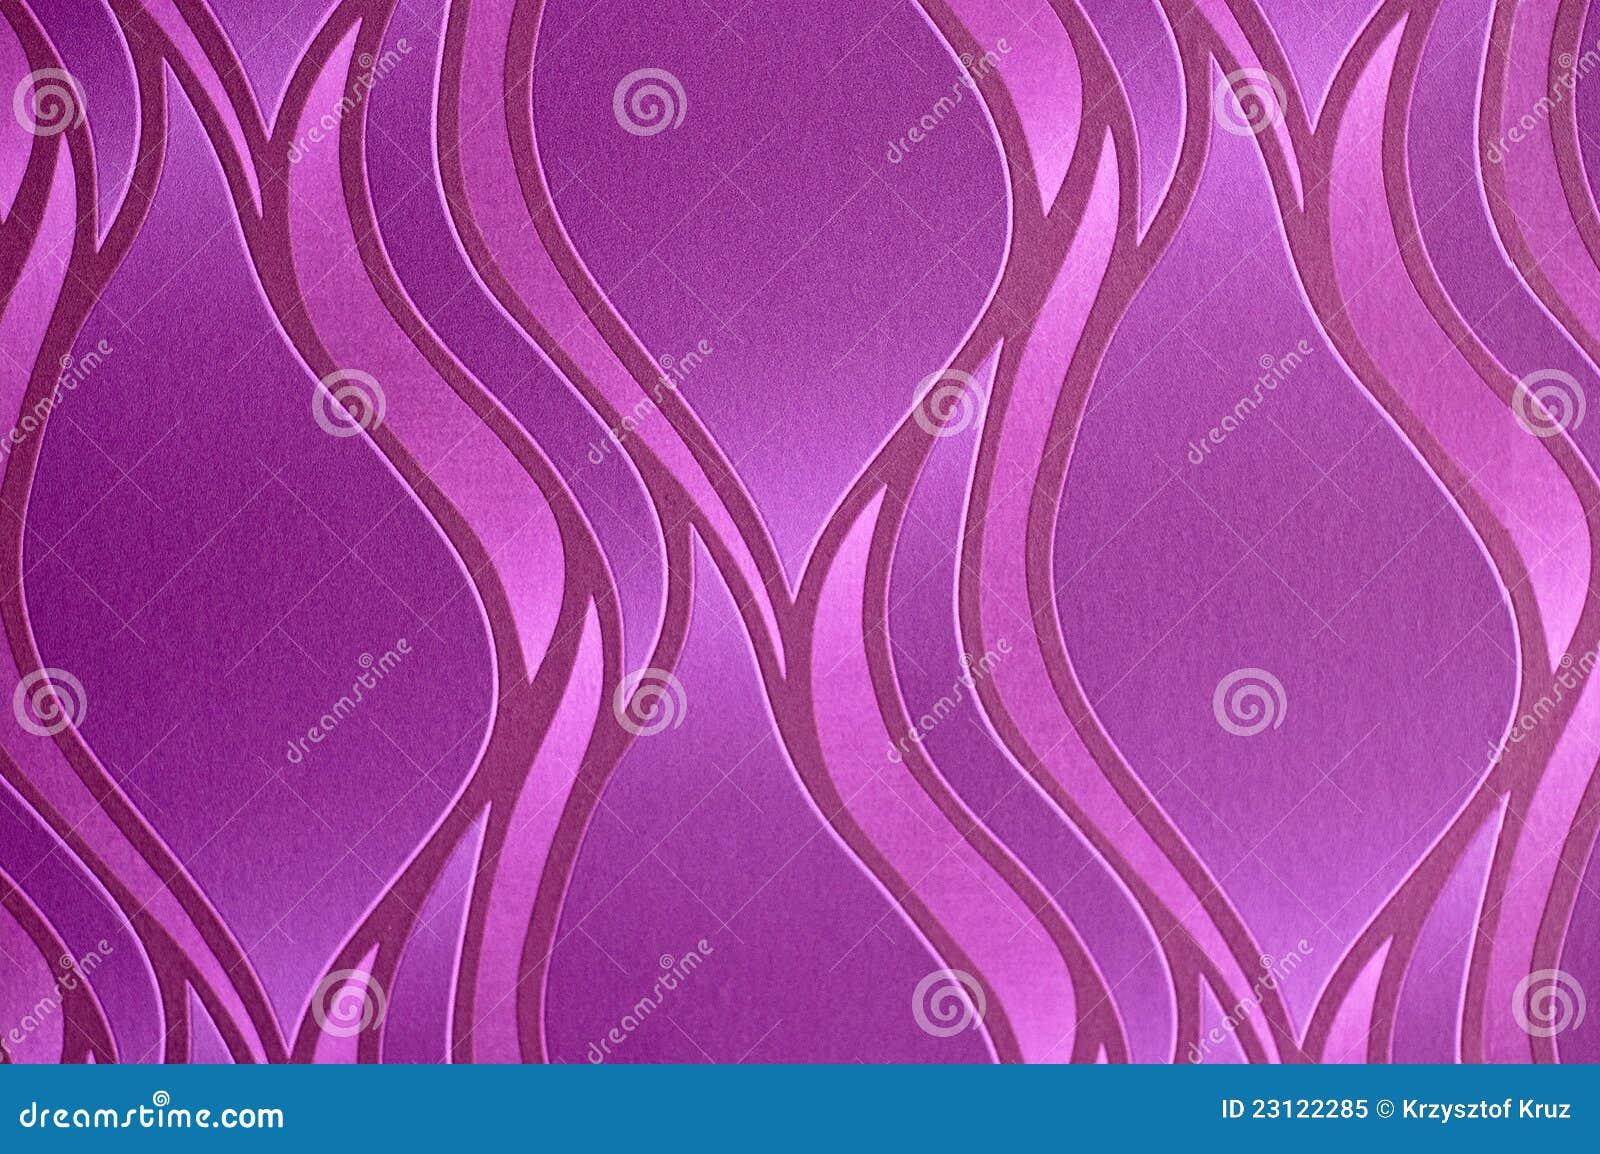 Purpury texture z wzorami